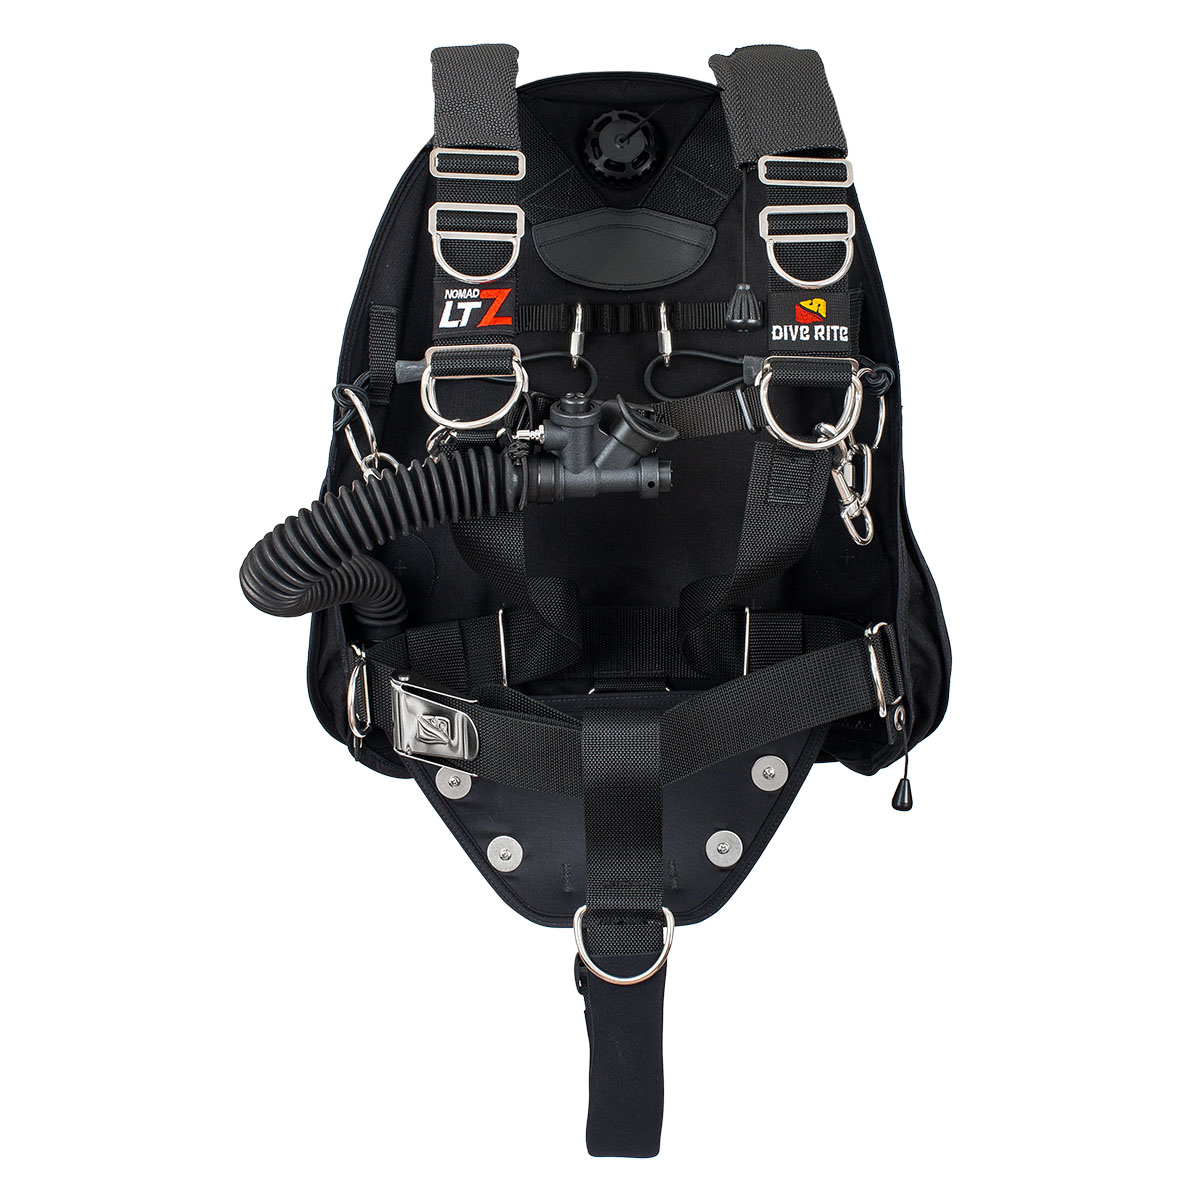 Nomad ltz sidemount system dive rite - Dive rite sidemount ...